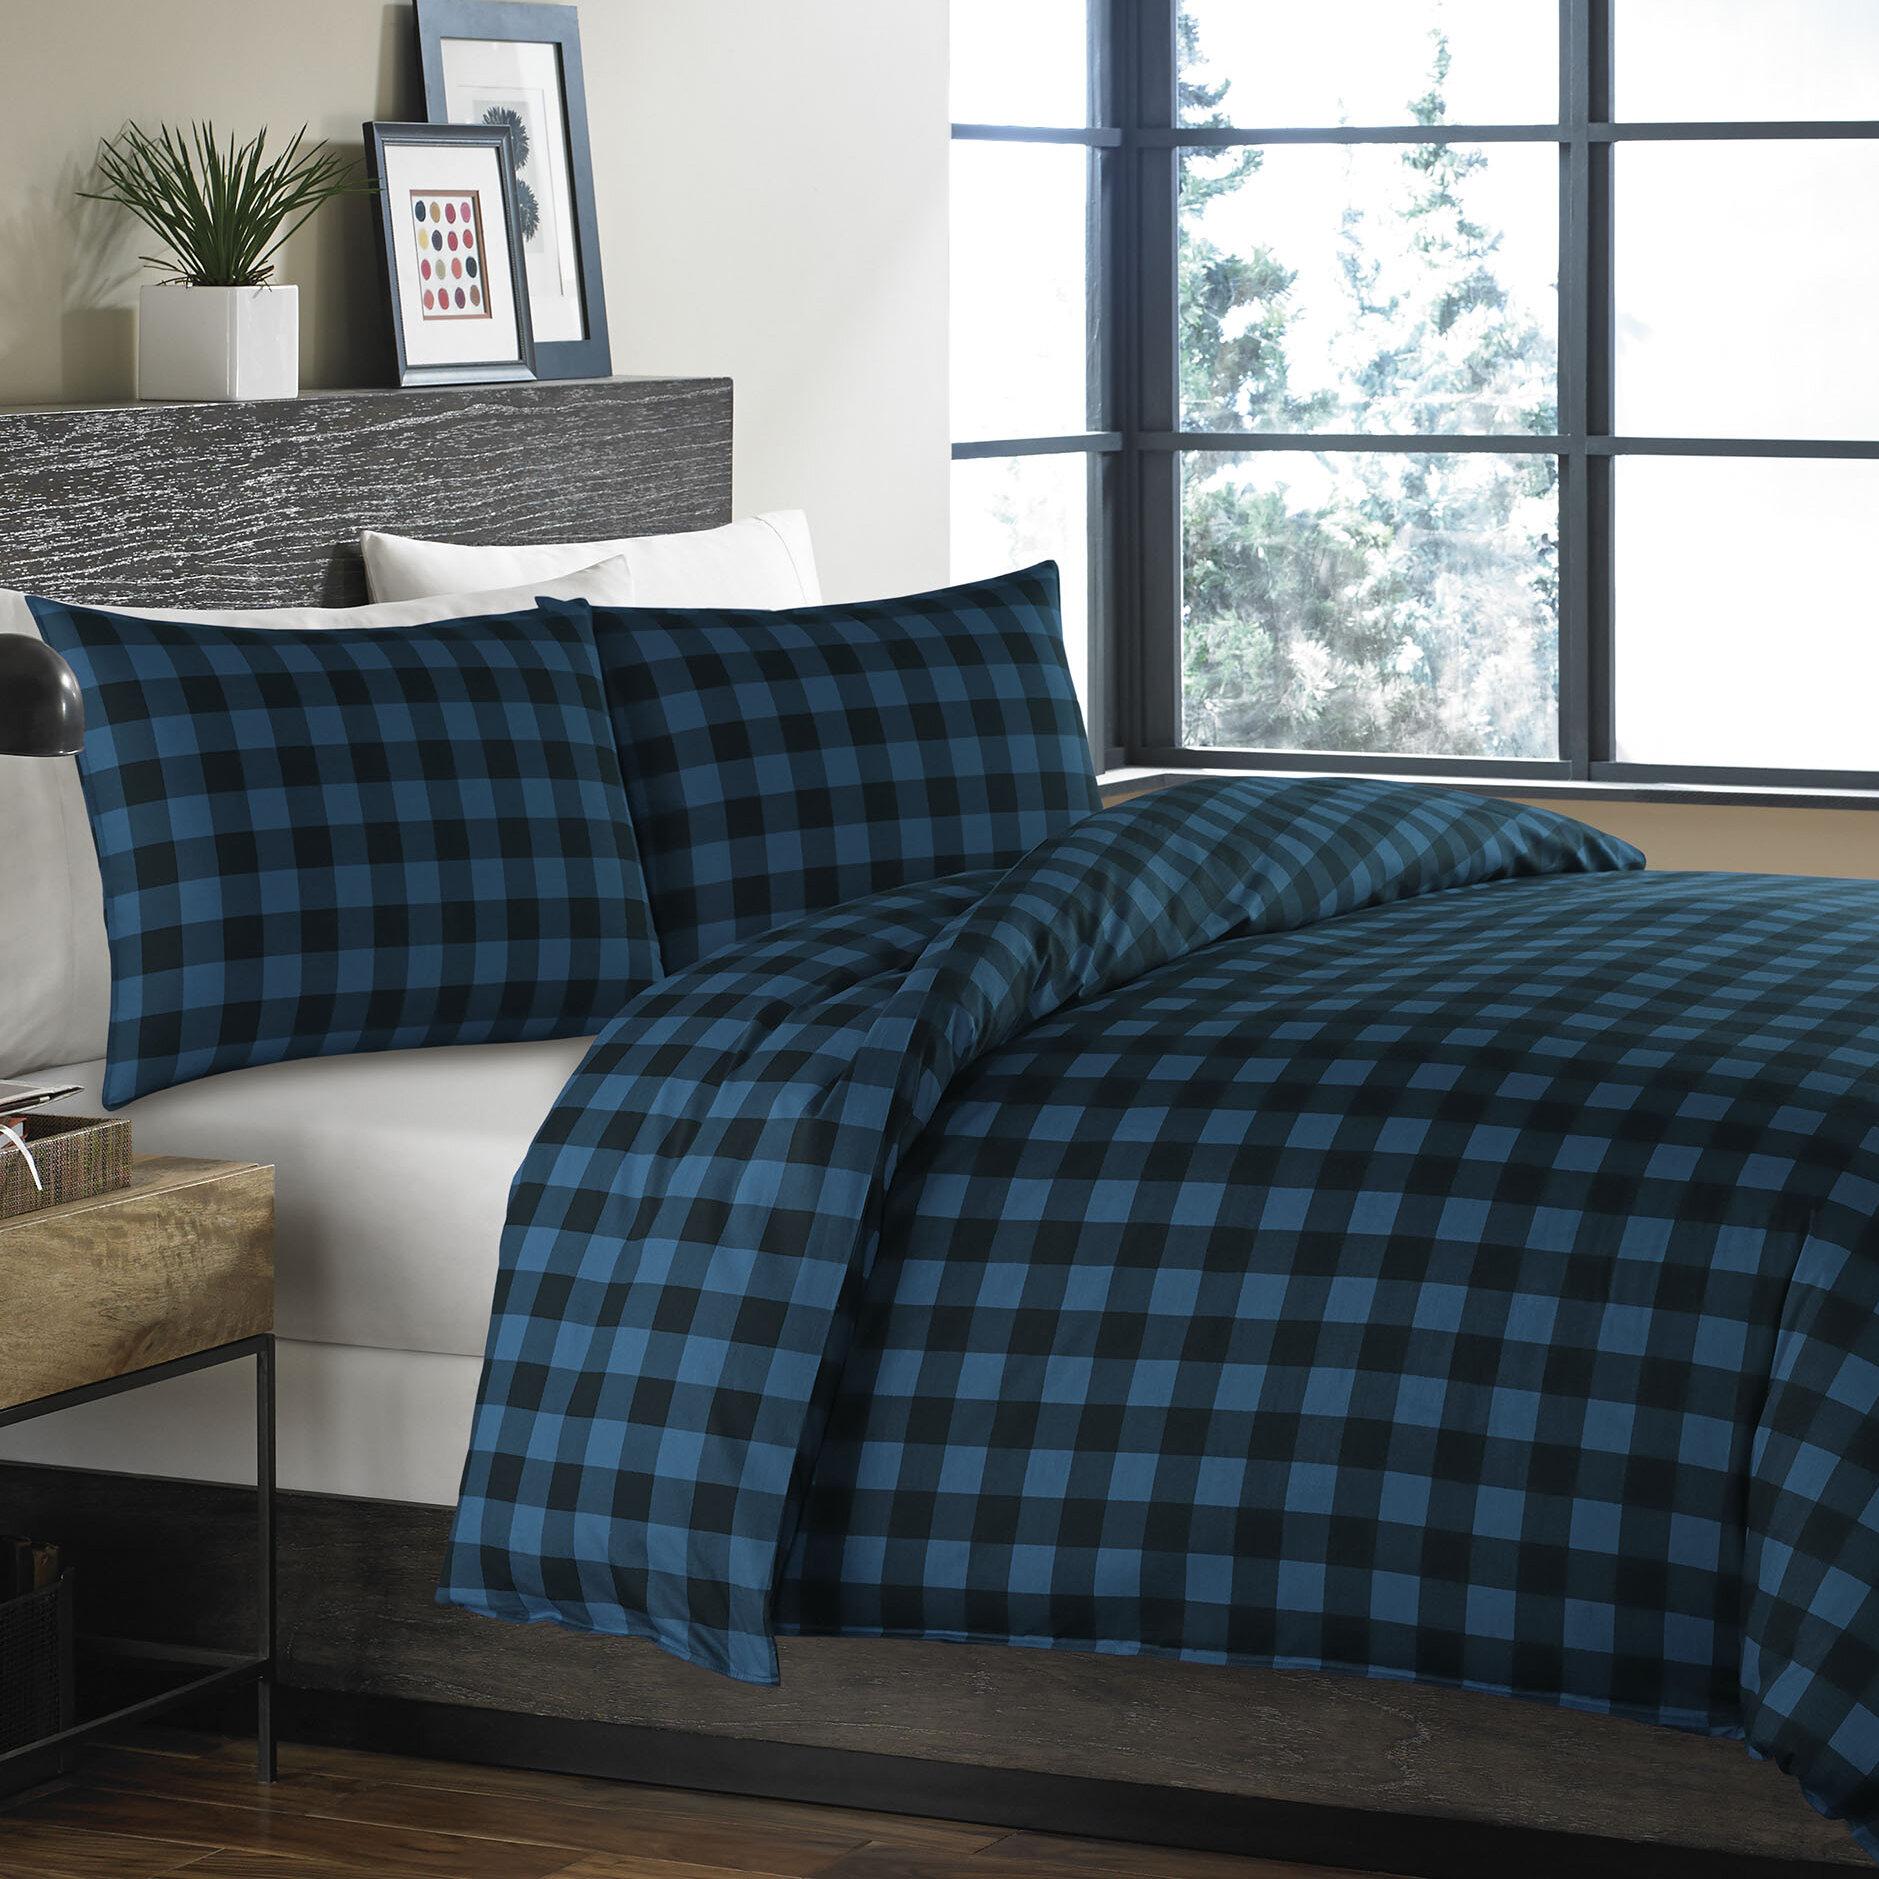 images eddie bauer plaid comforter bed mountain bedding set gallery